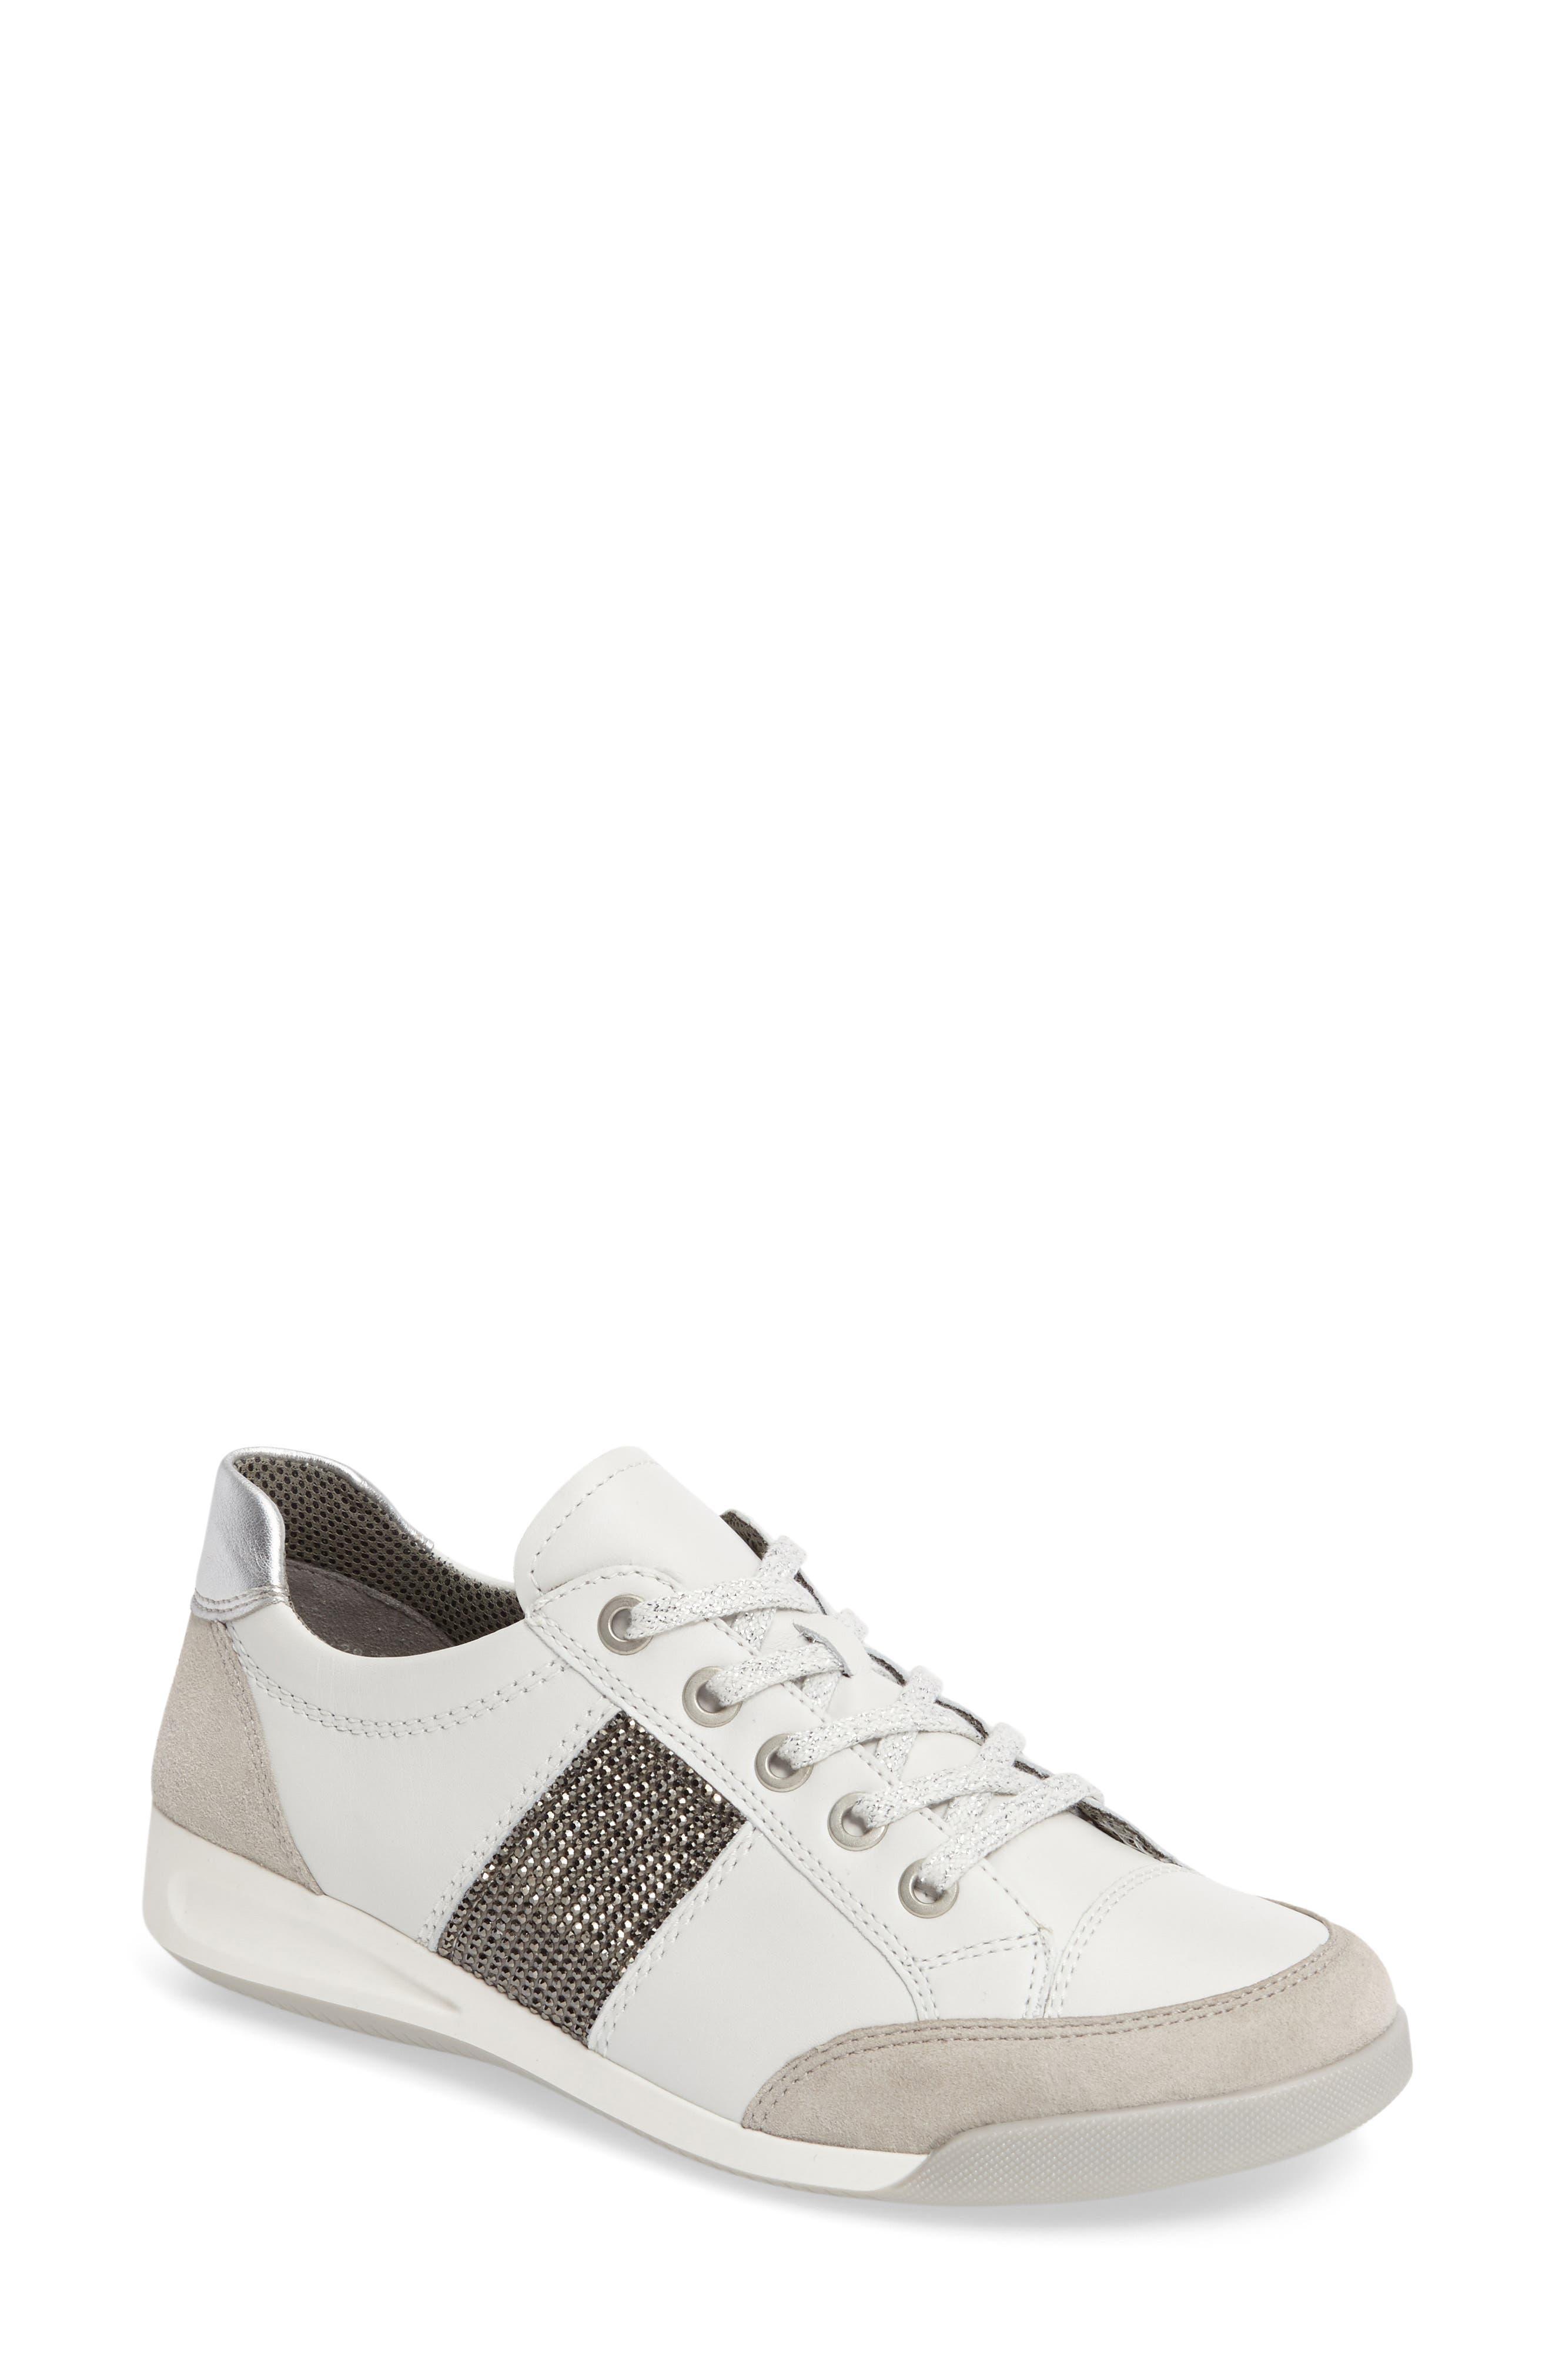 Alternate Image 1 Selected - ara Rickie Sneaker (Women)